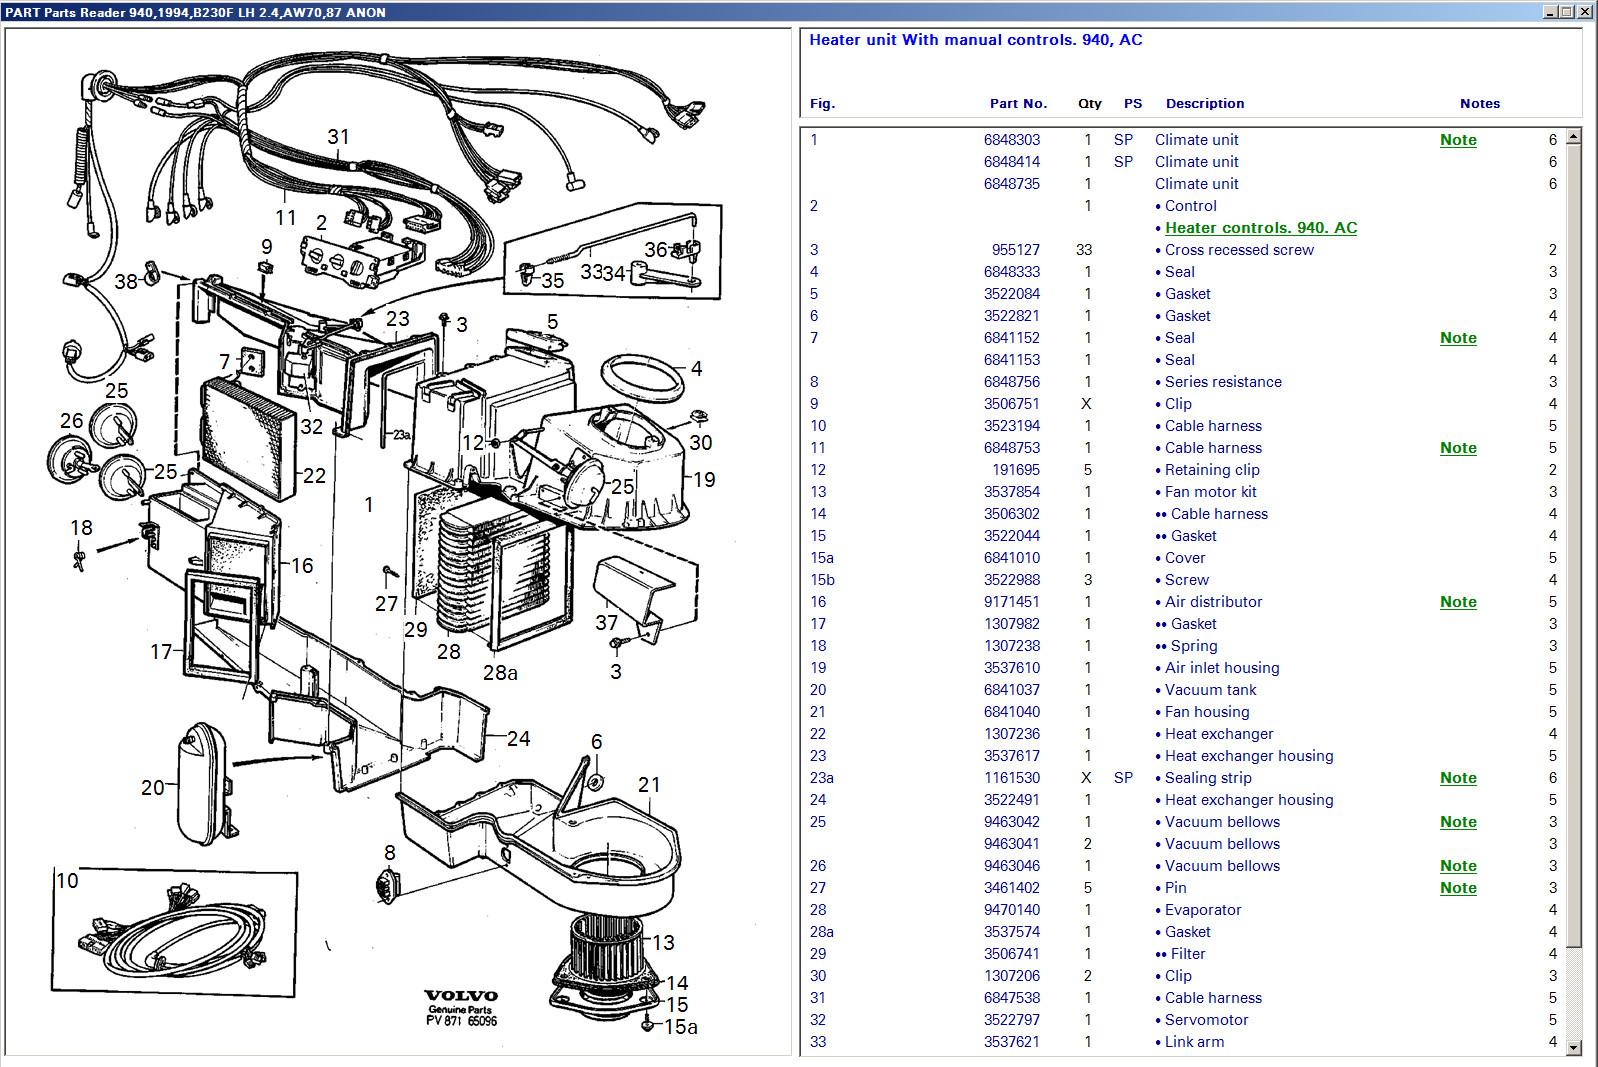 1991 volvo 740 volvo forums volvo enthusiasts forum click for bigger